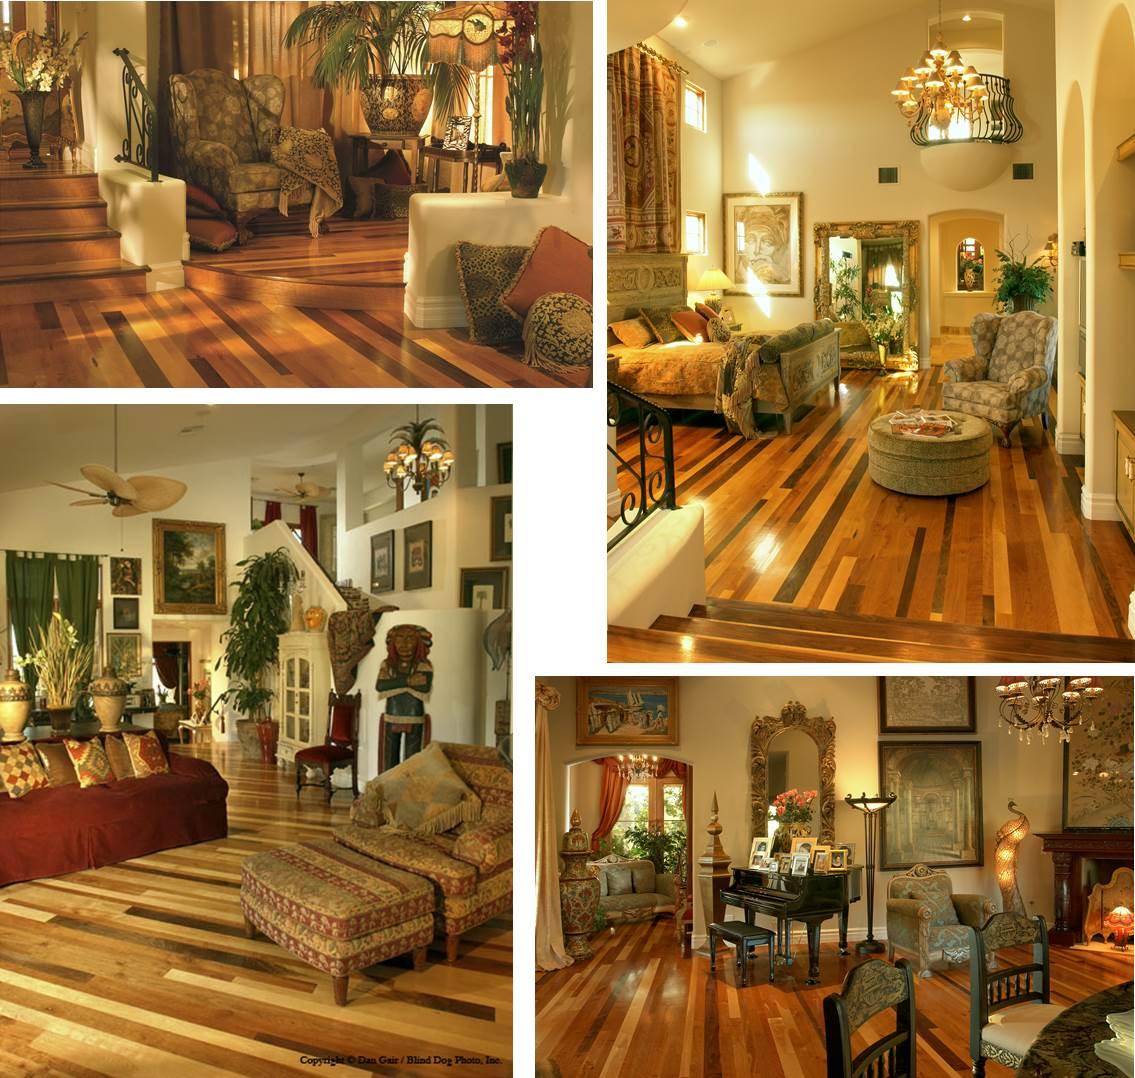 Cherry Wood floor and MAple Hardwood Flooring from Carlisle Wide Plank Floors